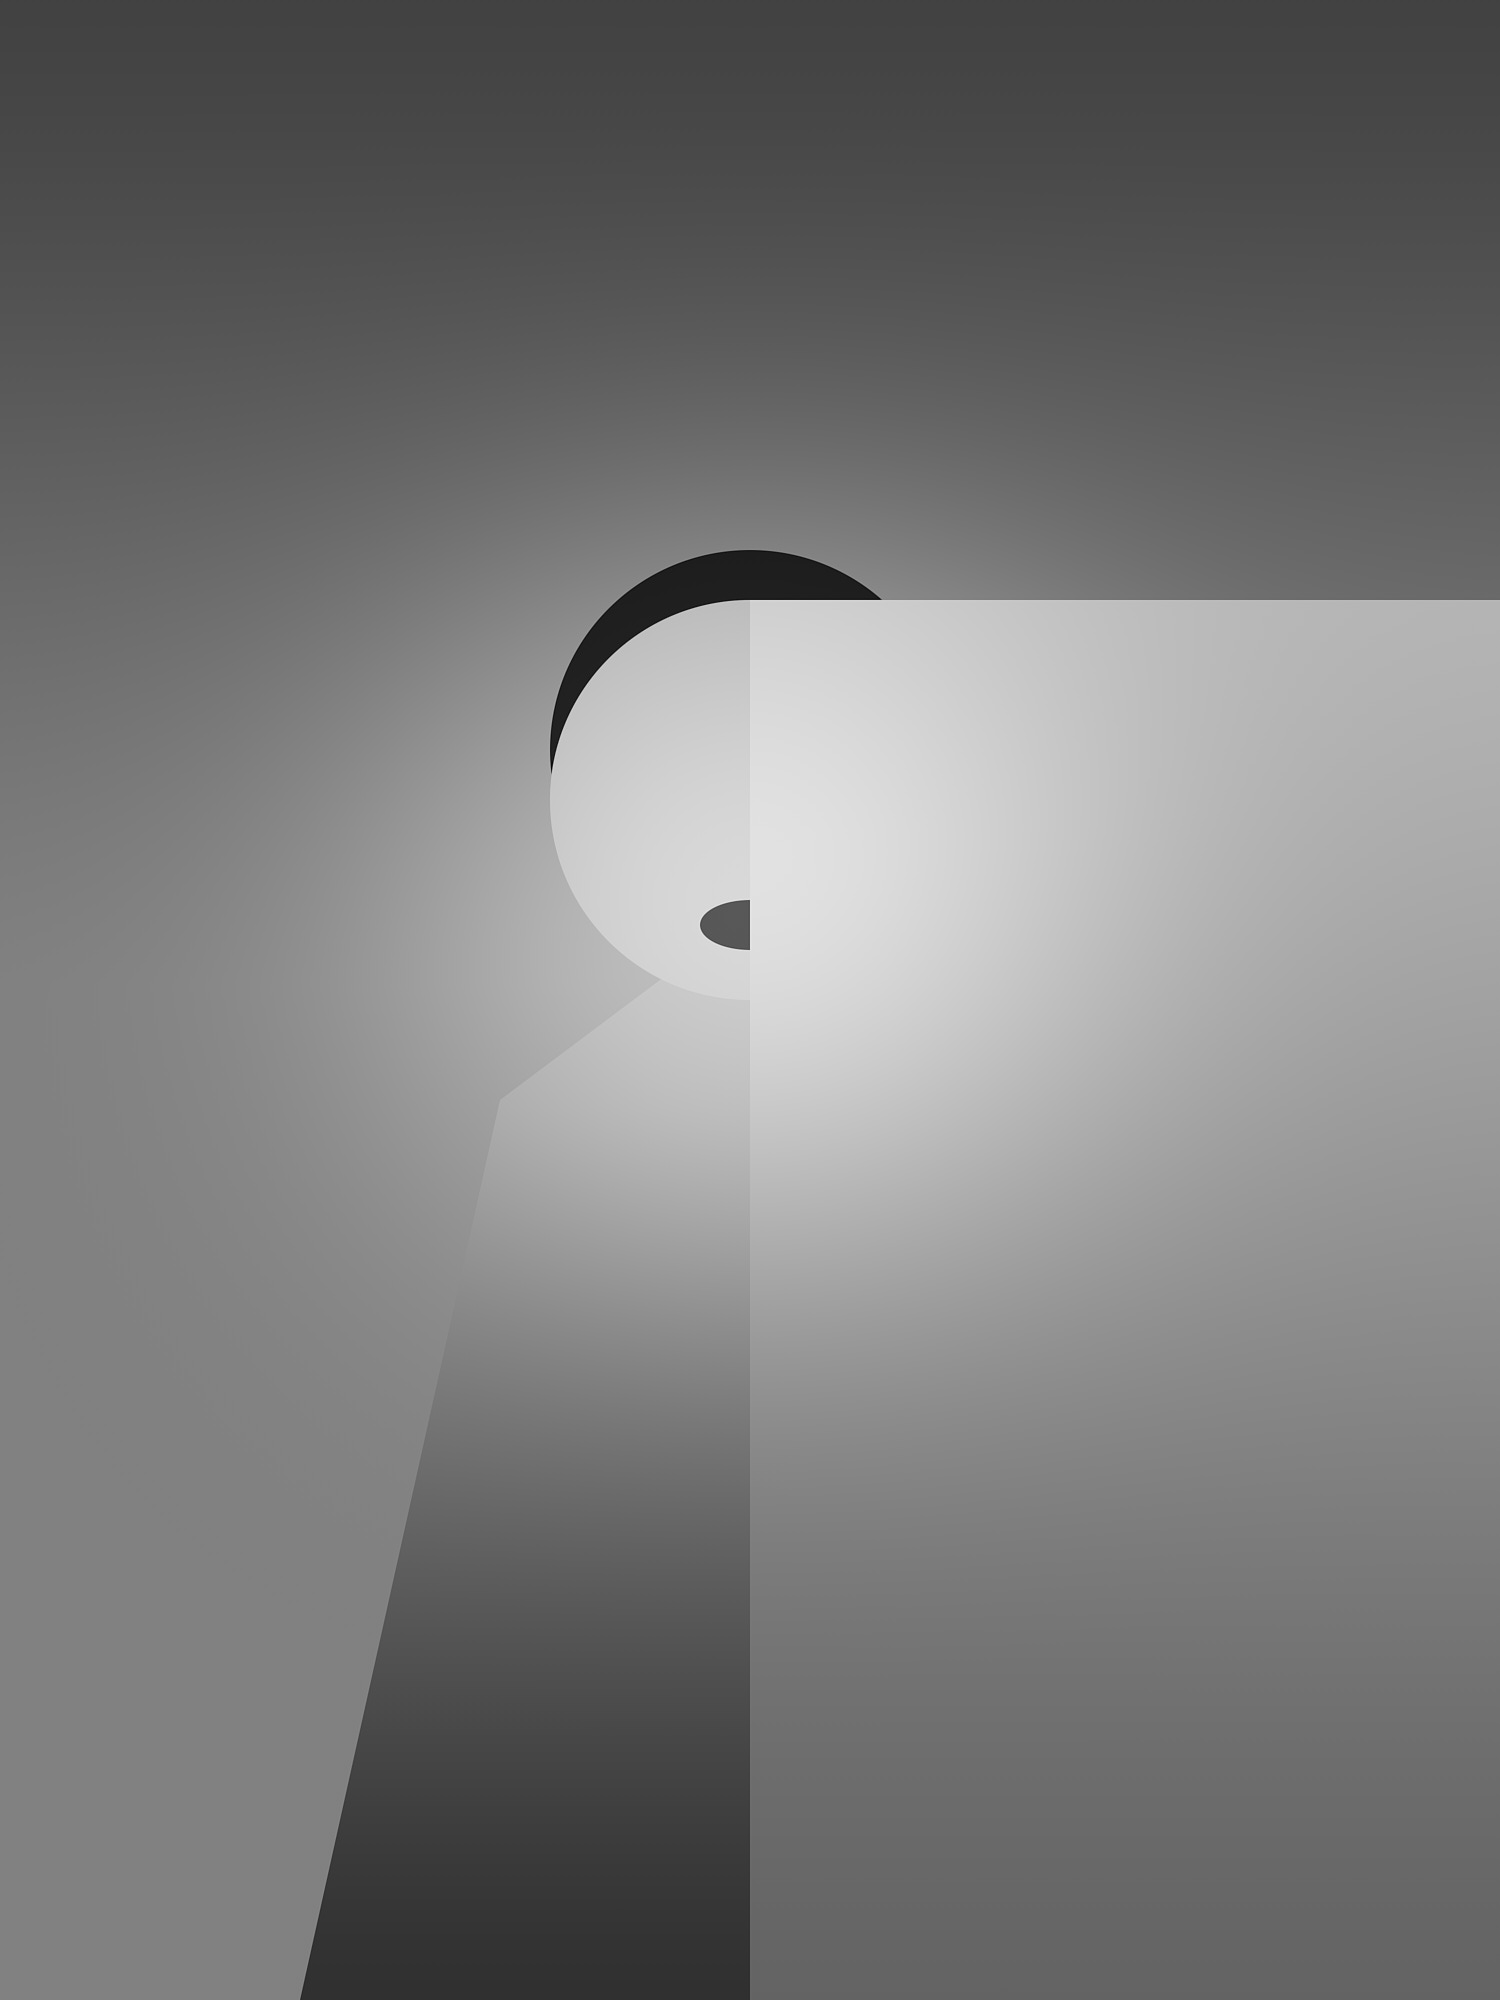 Concept of portrait in studio of Jade Codino for the art series Contrast